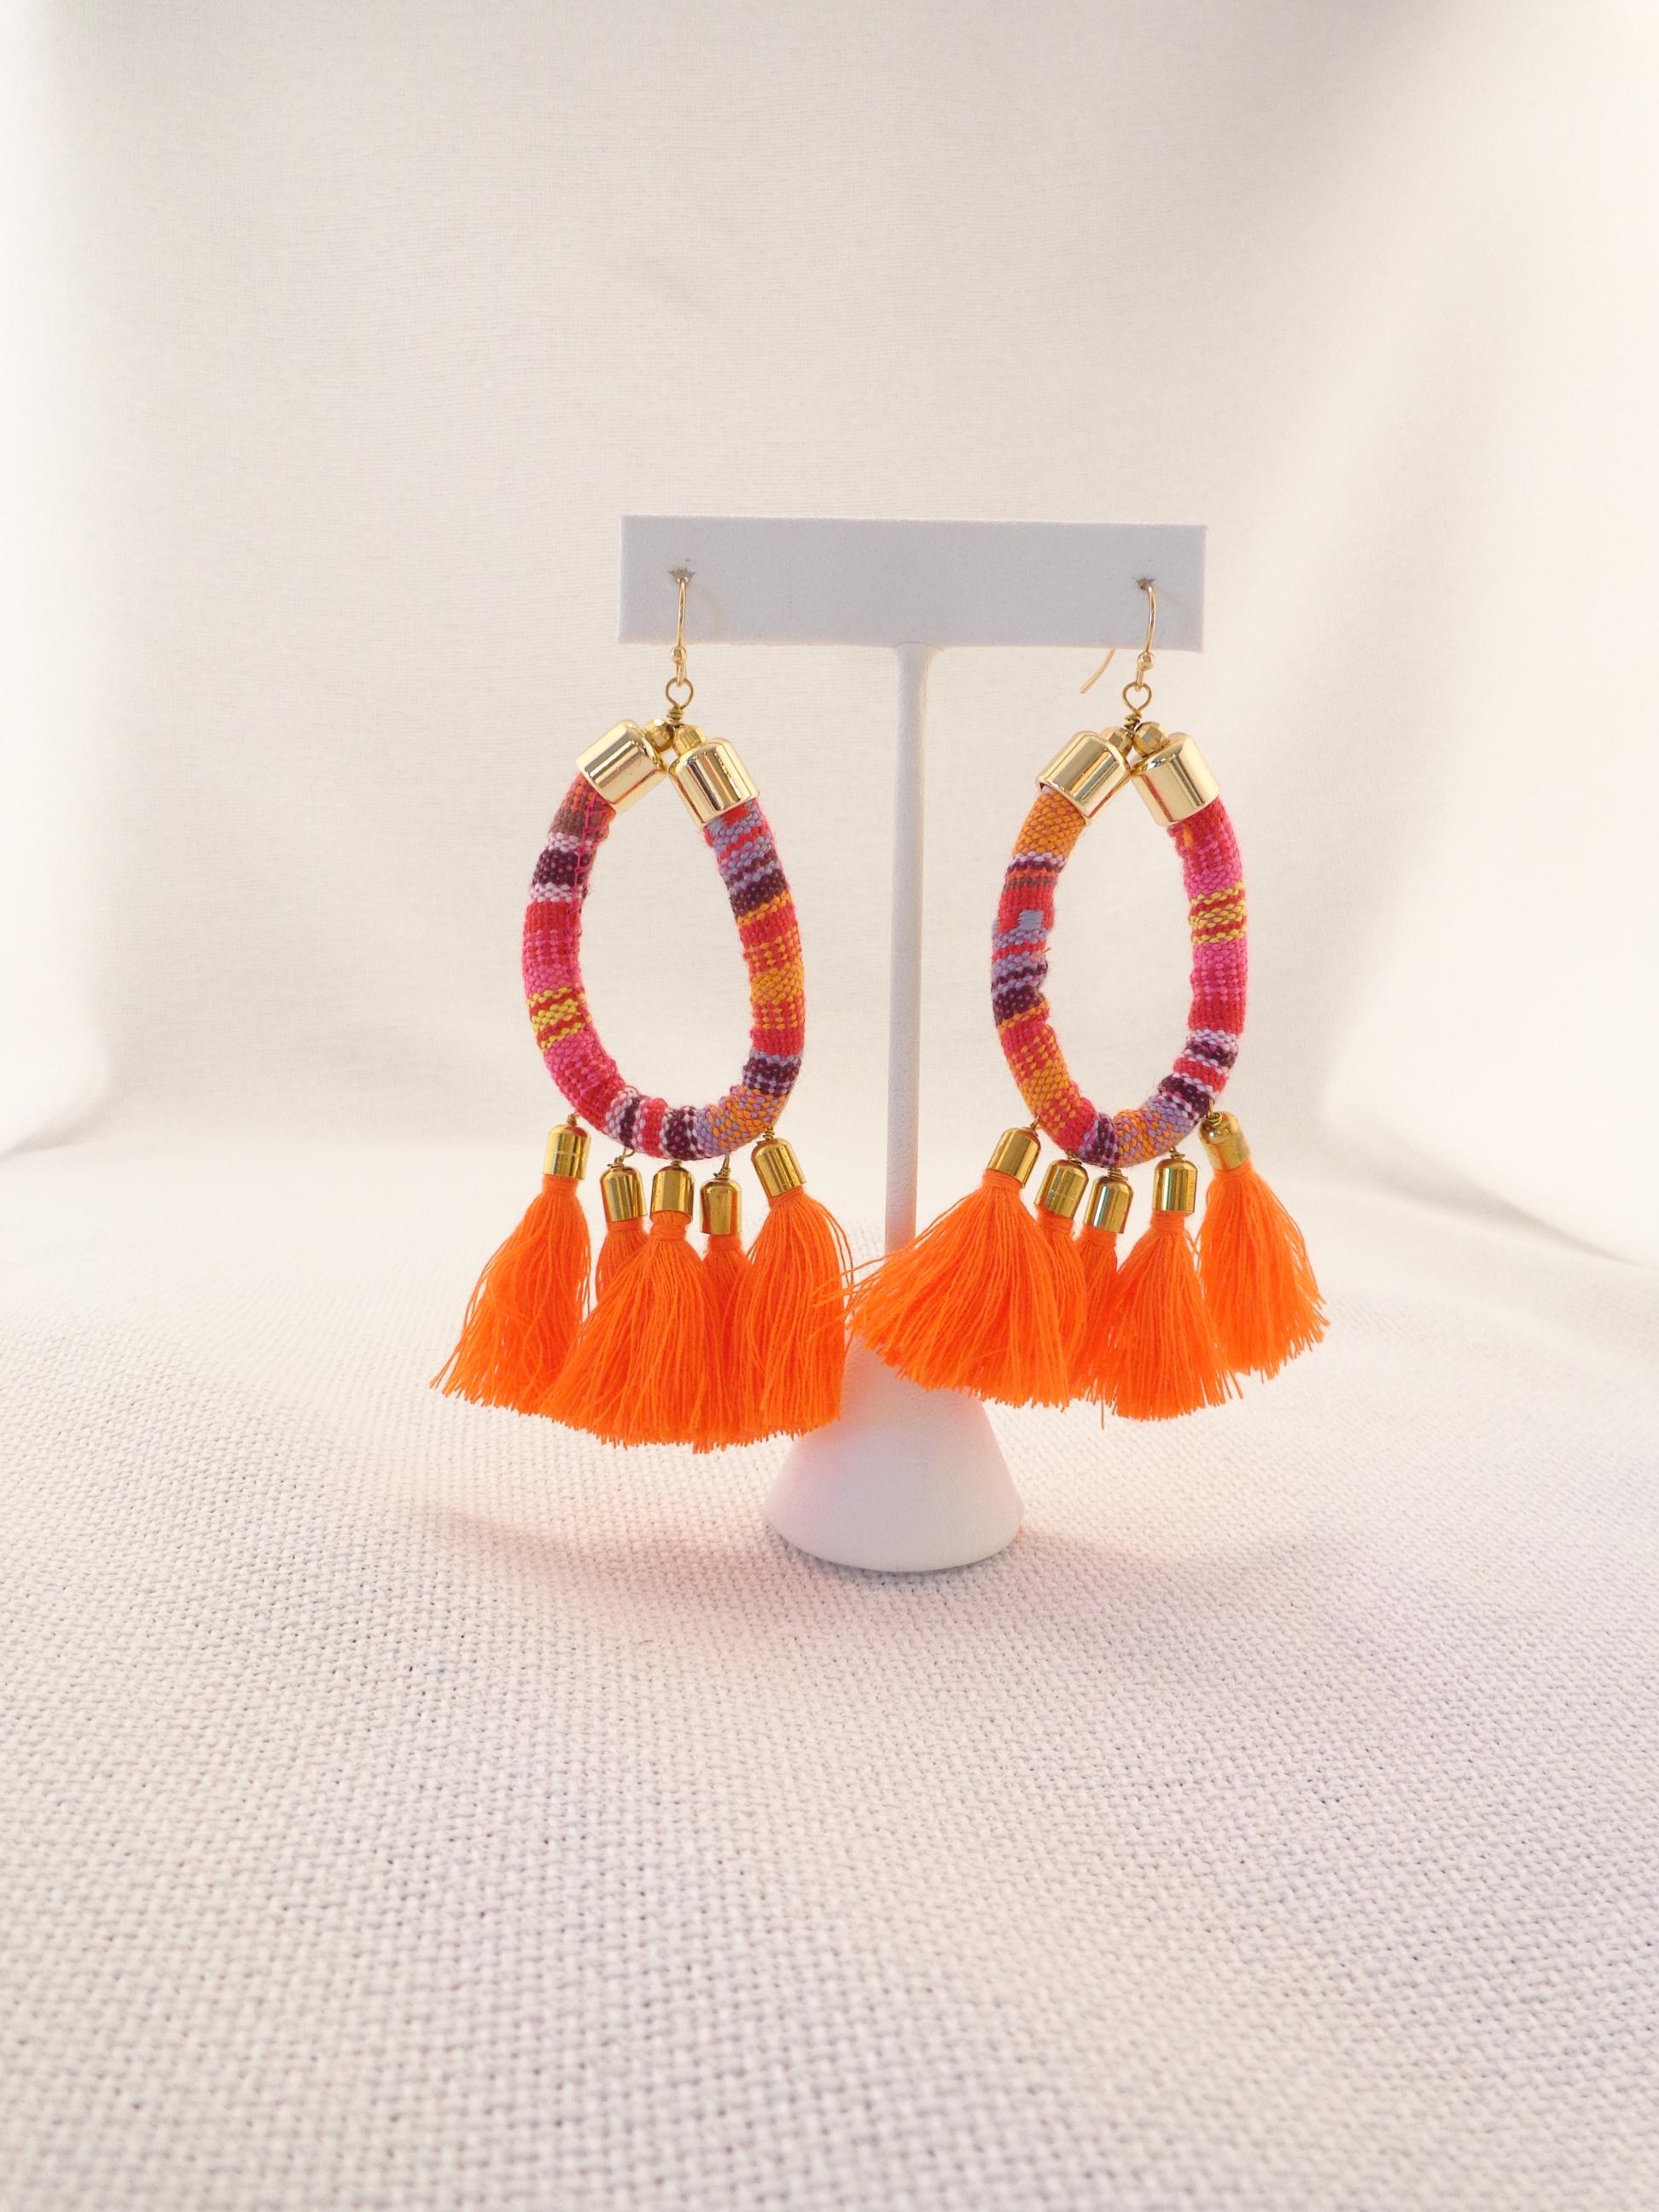 c0bc0e498f5dfc Fabric Tassel Earrings - Orange/Purple | Lydia Lister Jewelry